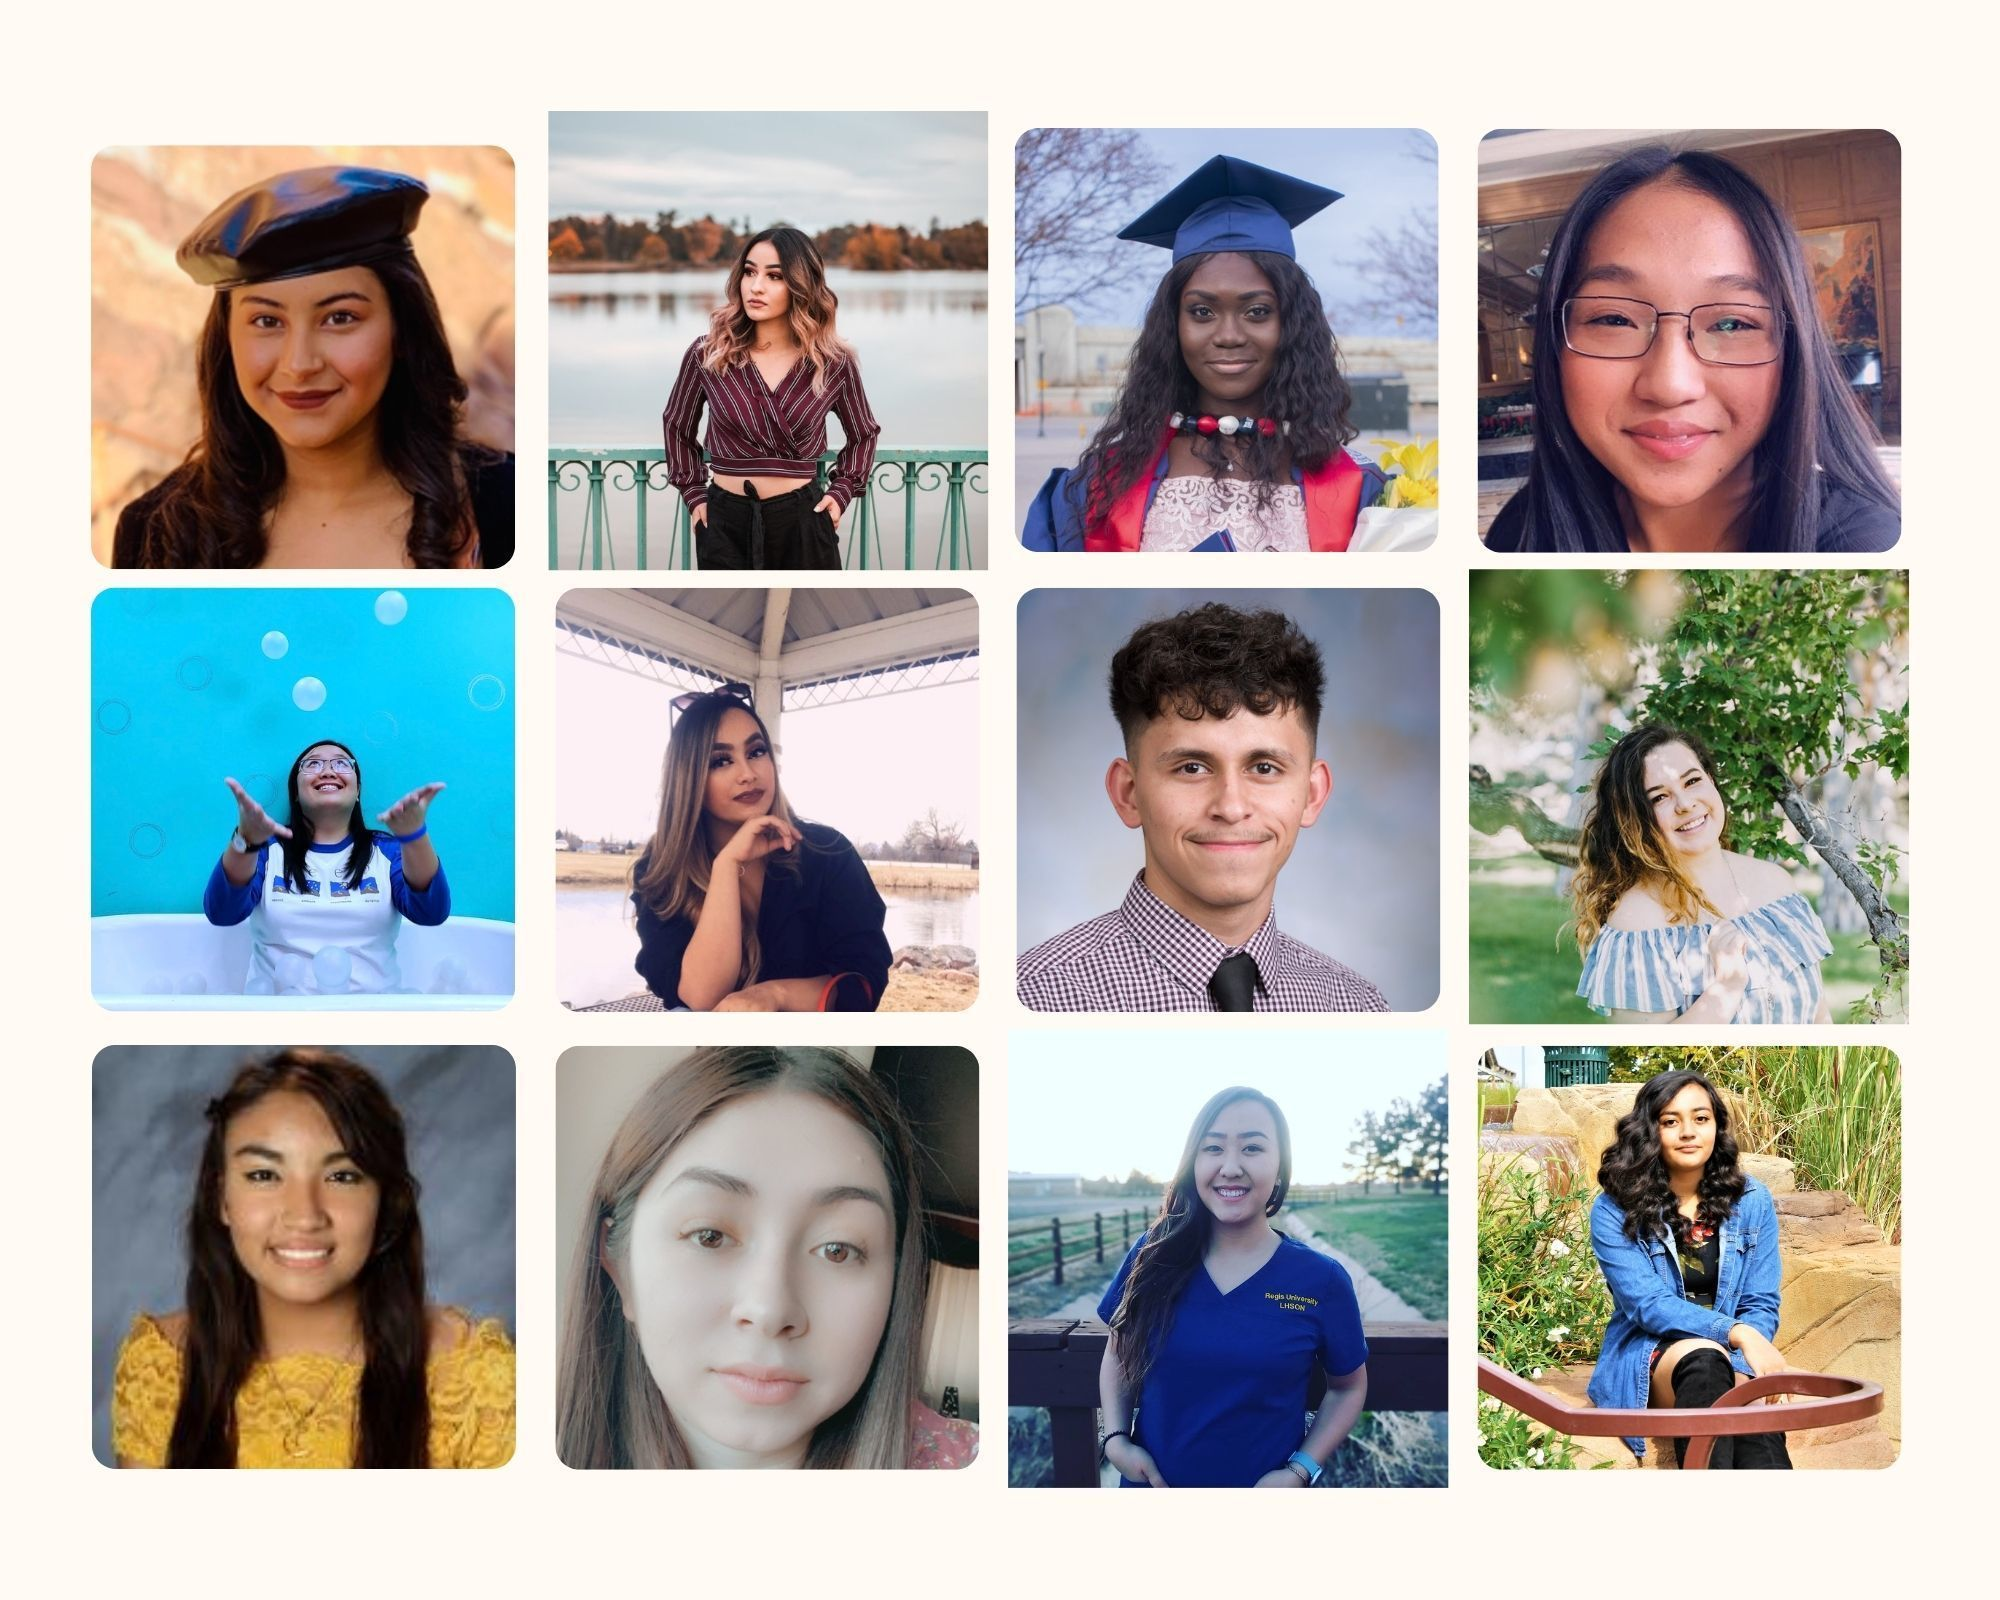 2020 WPSF Scholarship Application opens soon!